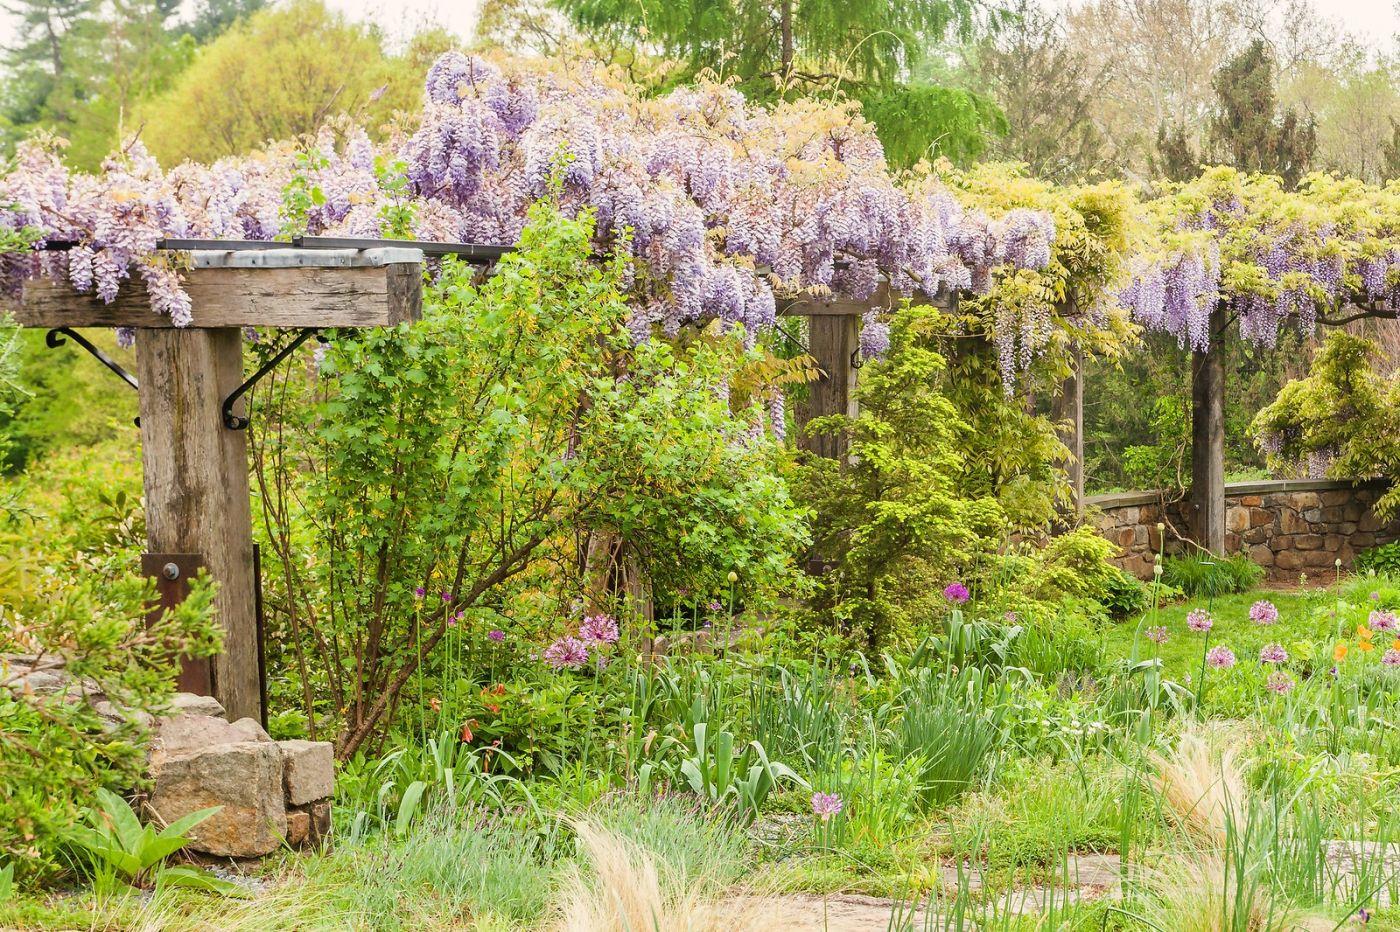 Chanticleer花园,那年盛开的紫藤花_图1-12